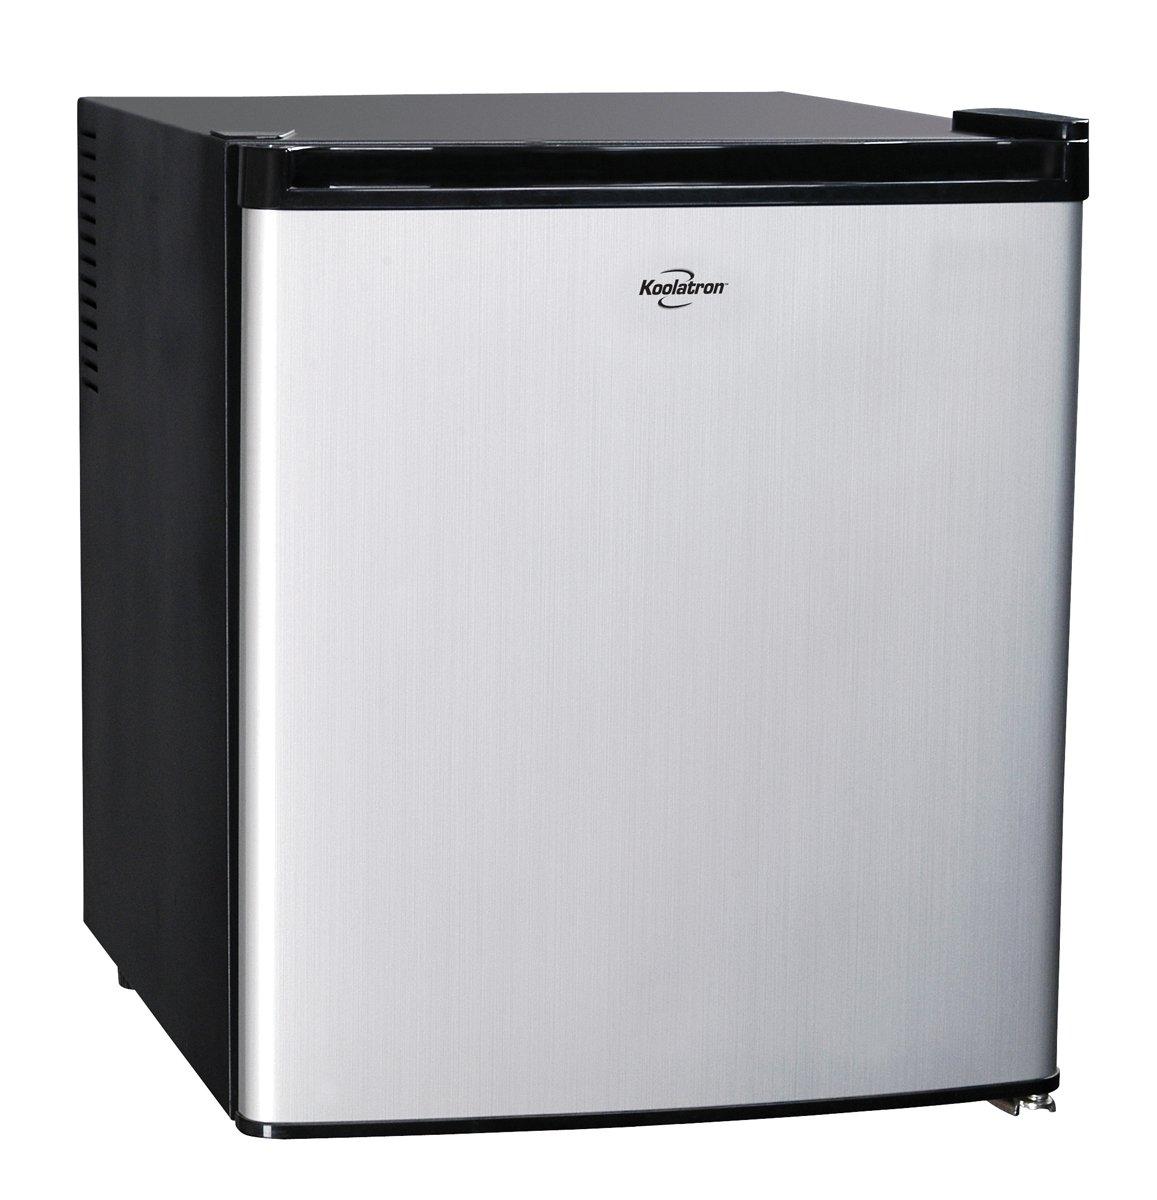 Koolatron KCR40B AC/DC Hybrid Heat Pipe Refrigerator, 1.7 cu. ft, Silver